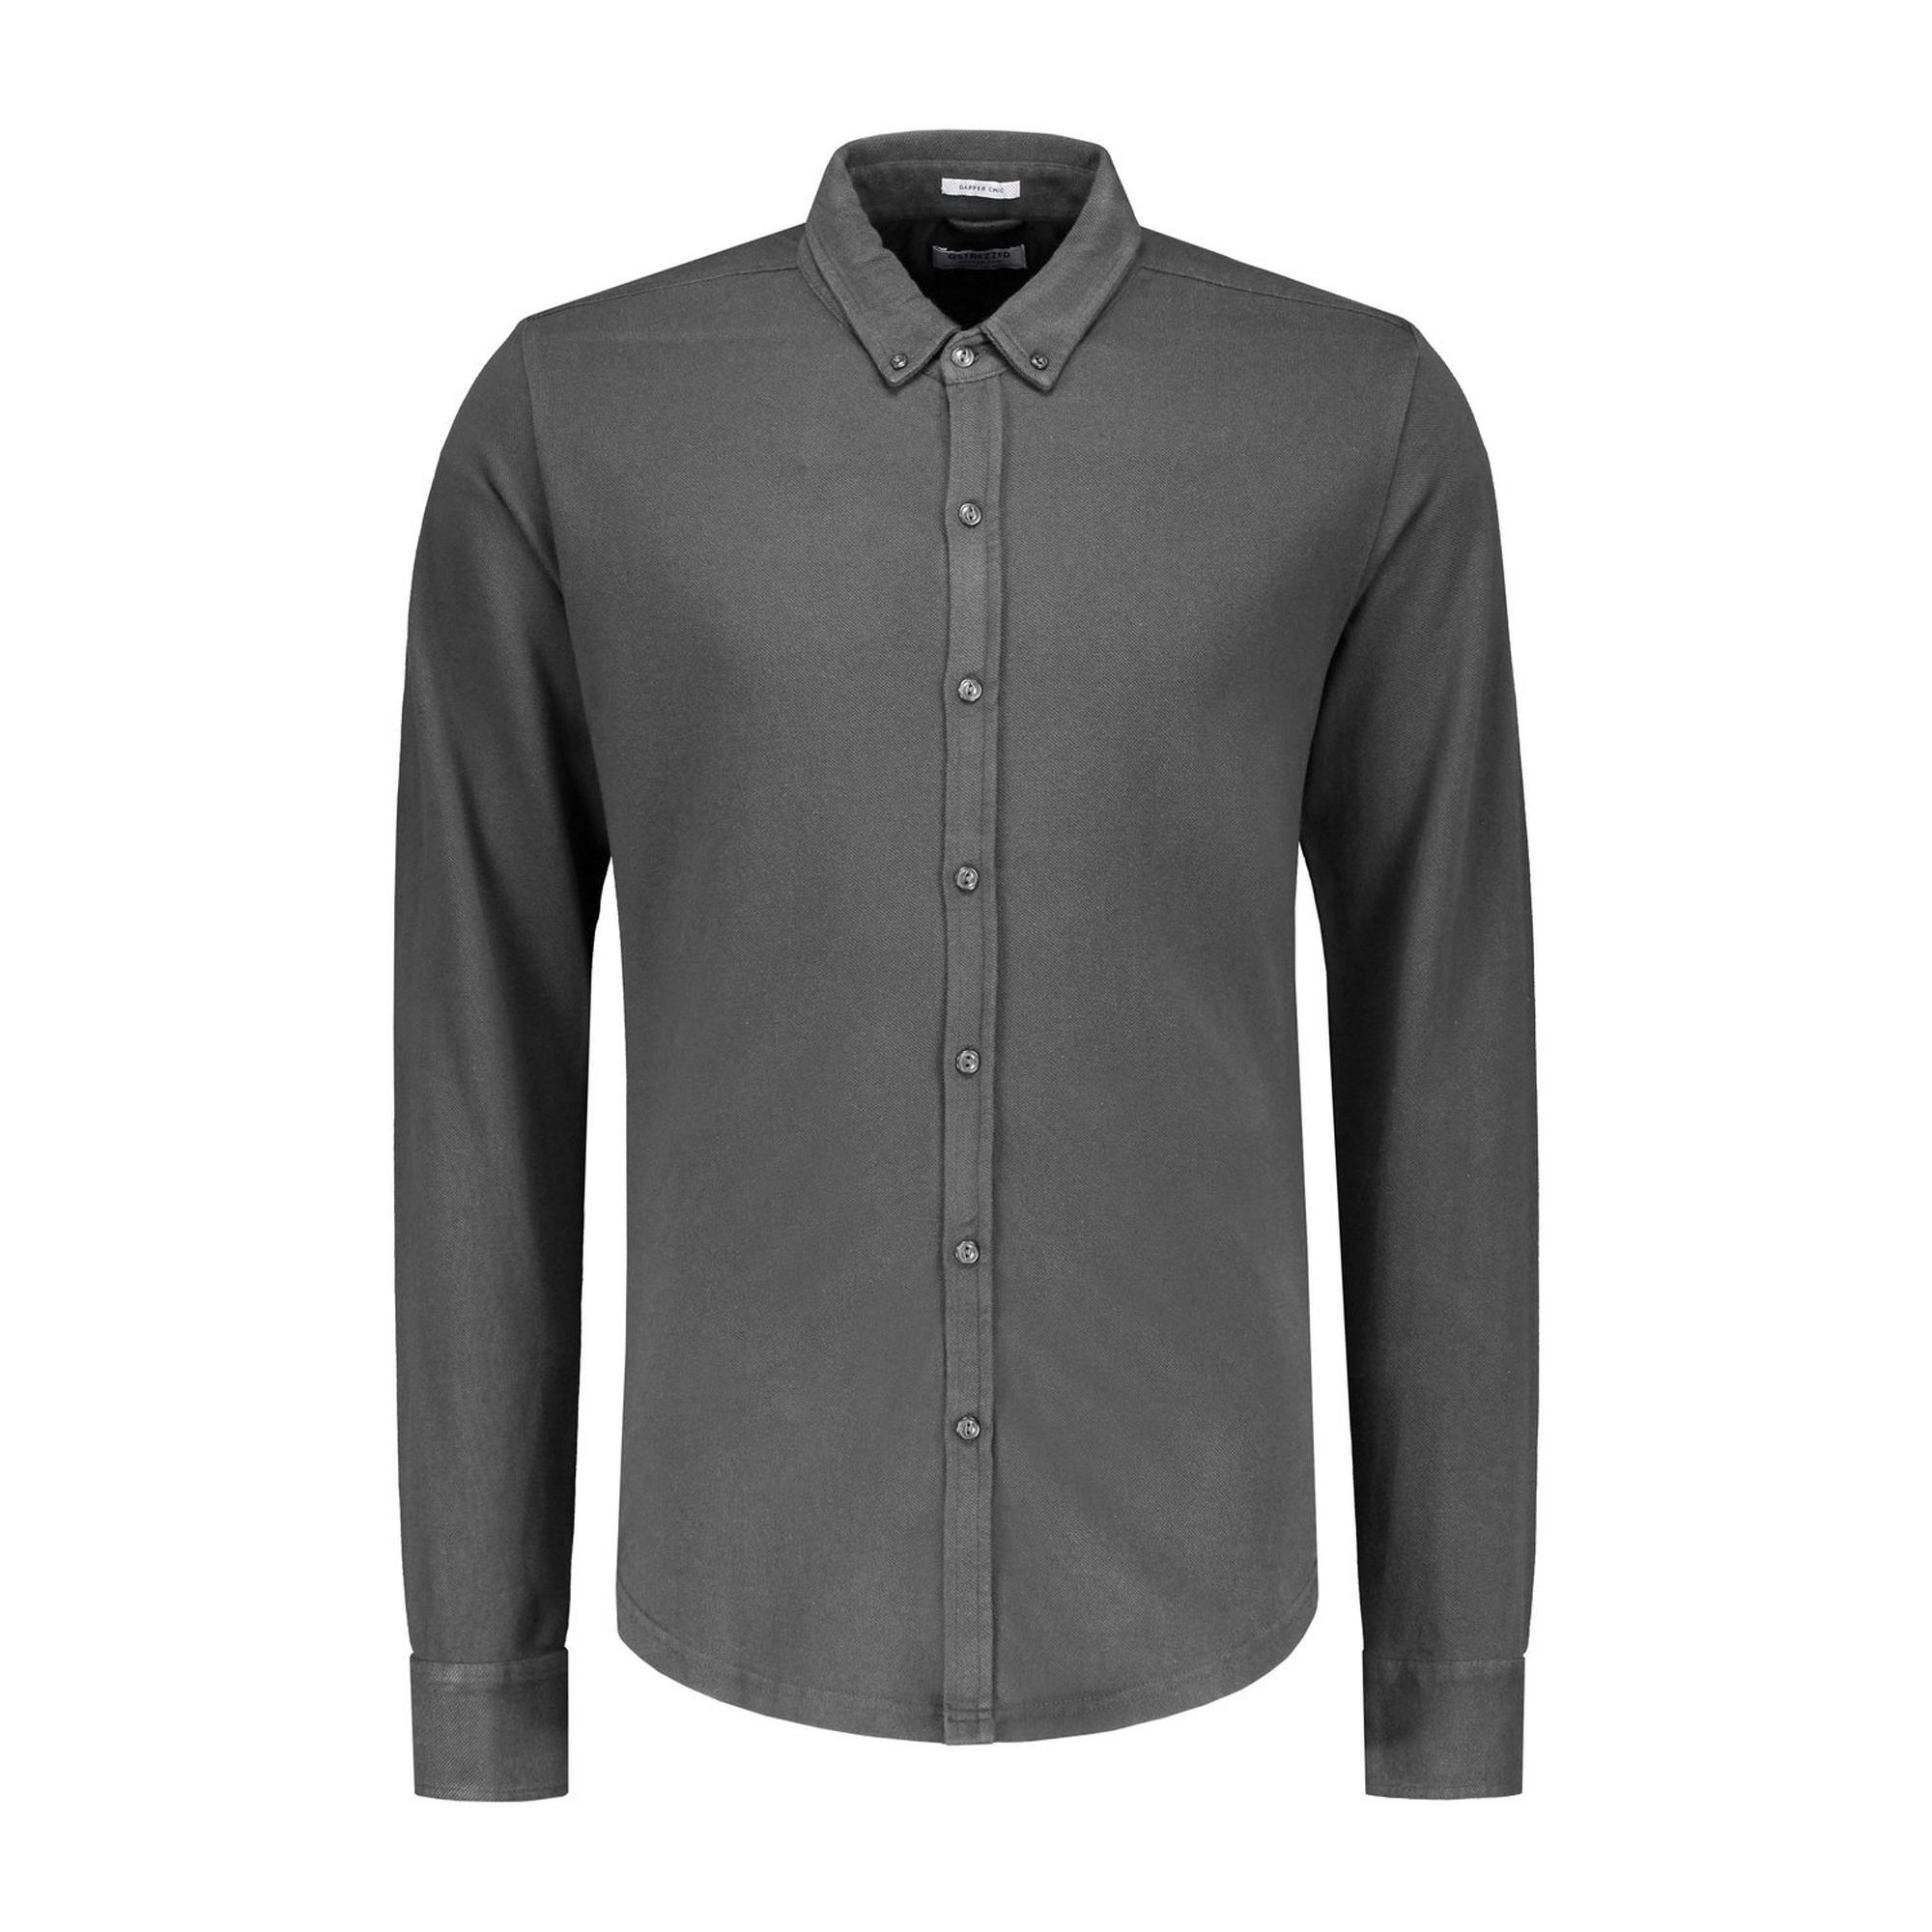 Men's Brush Pique Woven Long Sleeve Shirt